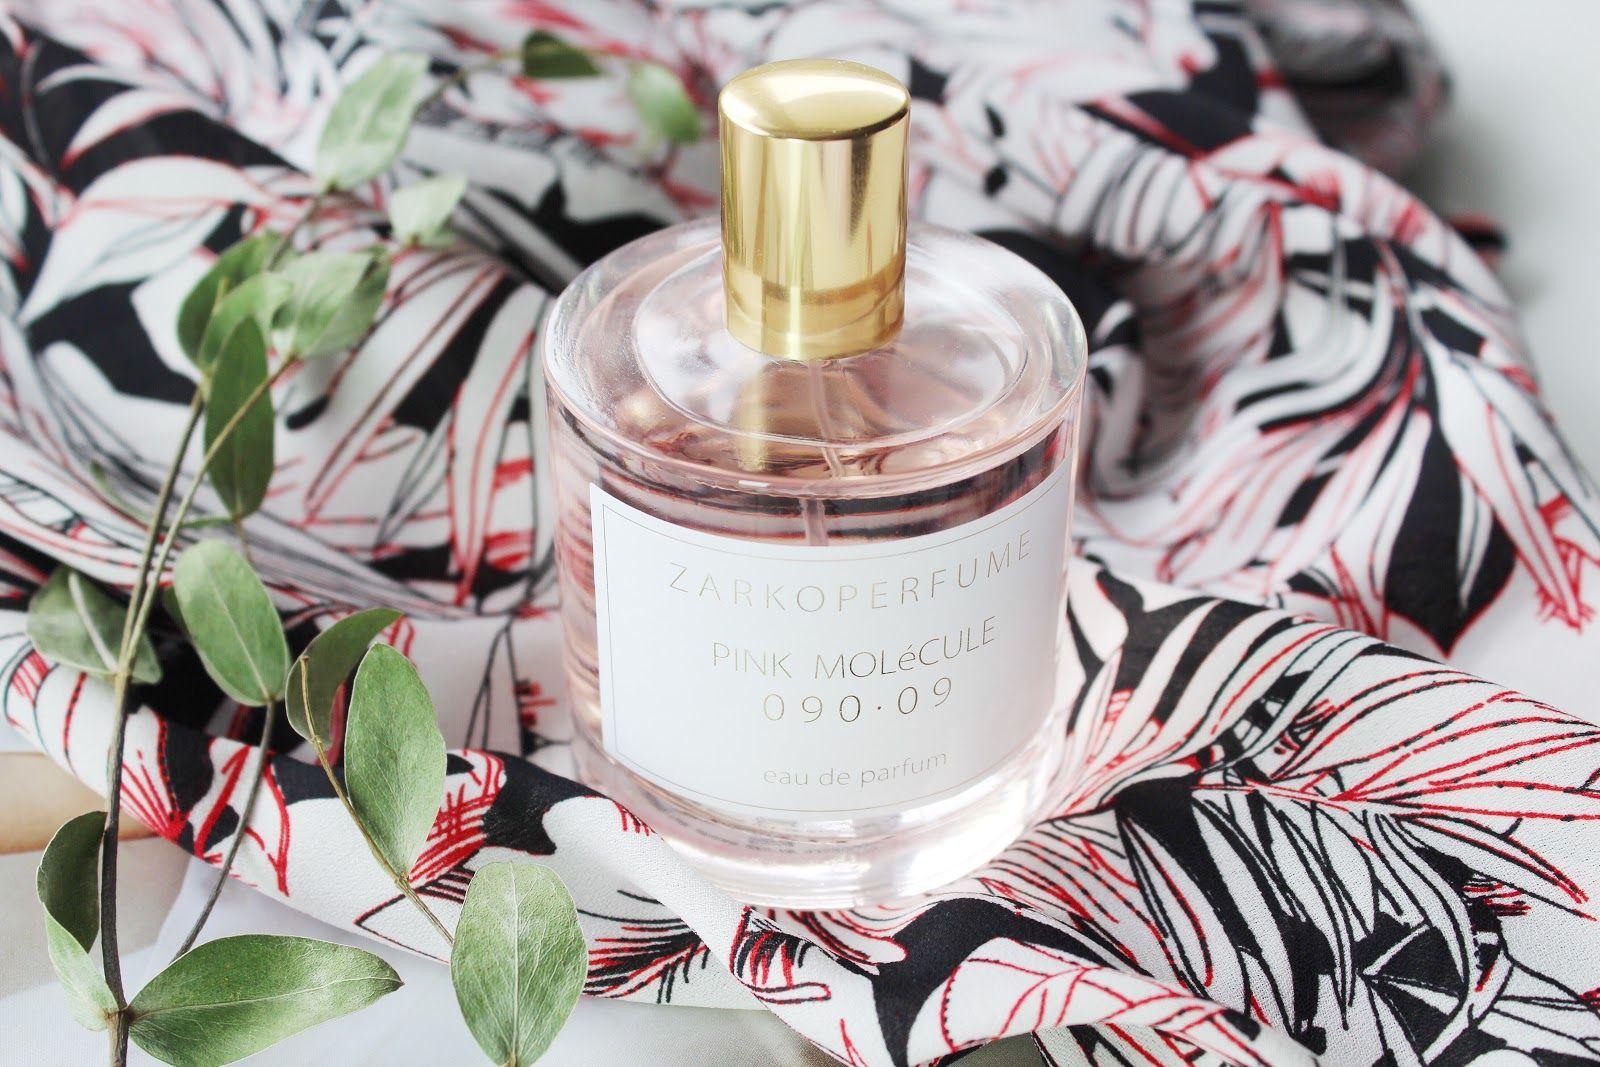 Populære ZARKOPERFUME PINK MOLECULE 090.09 | Perfume in 2019 | Perfume TX-64